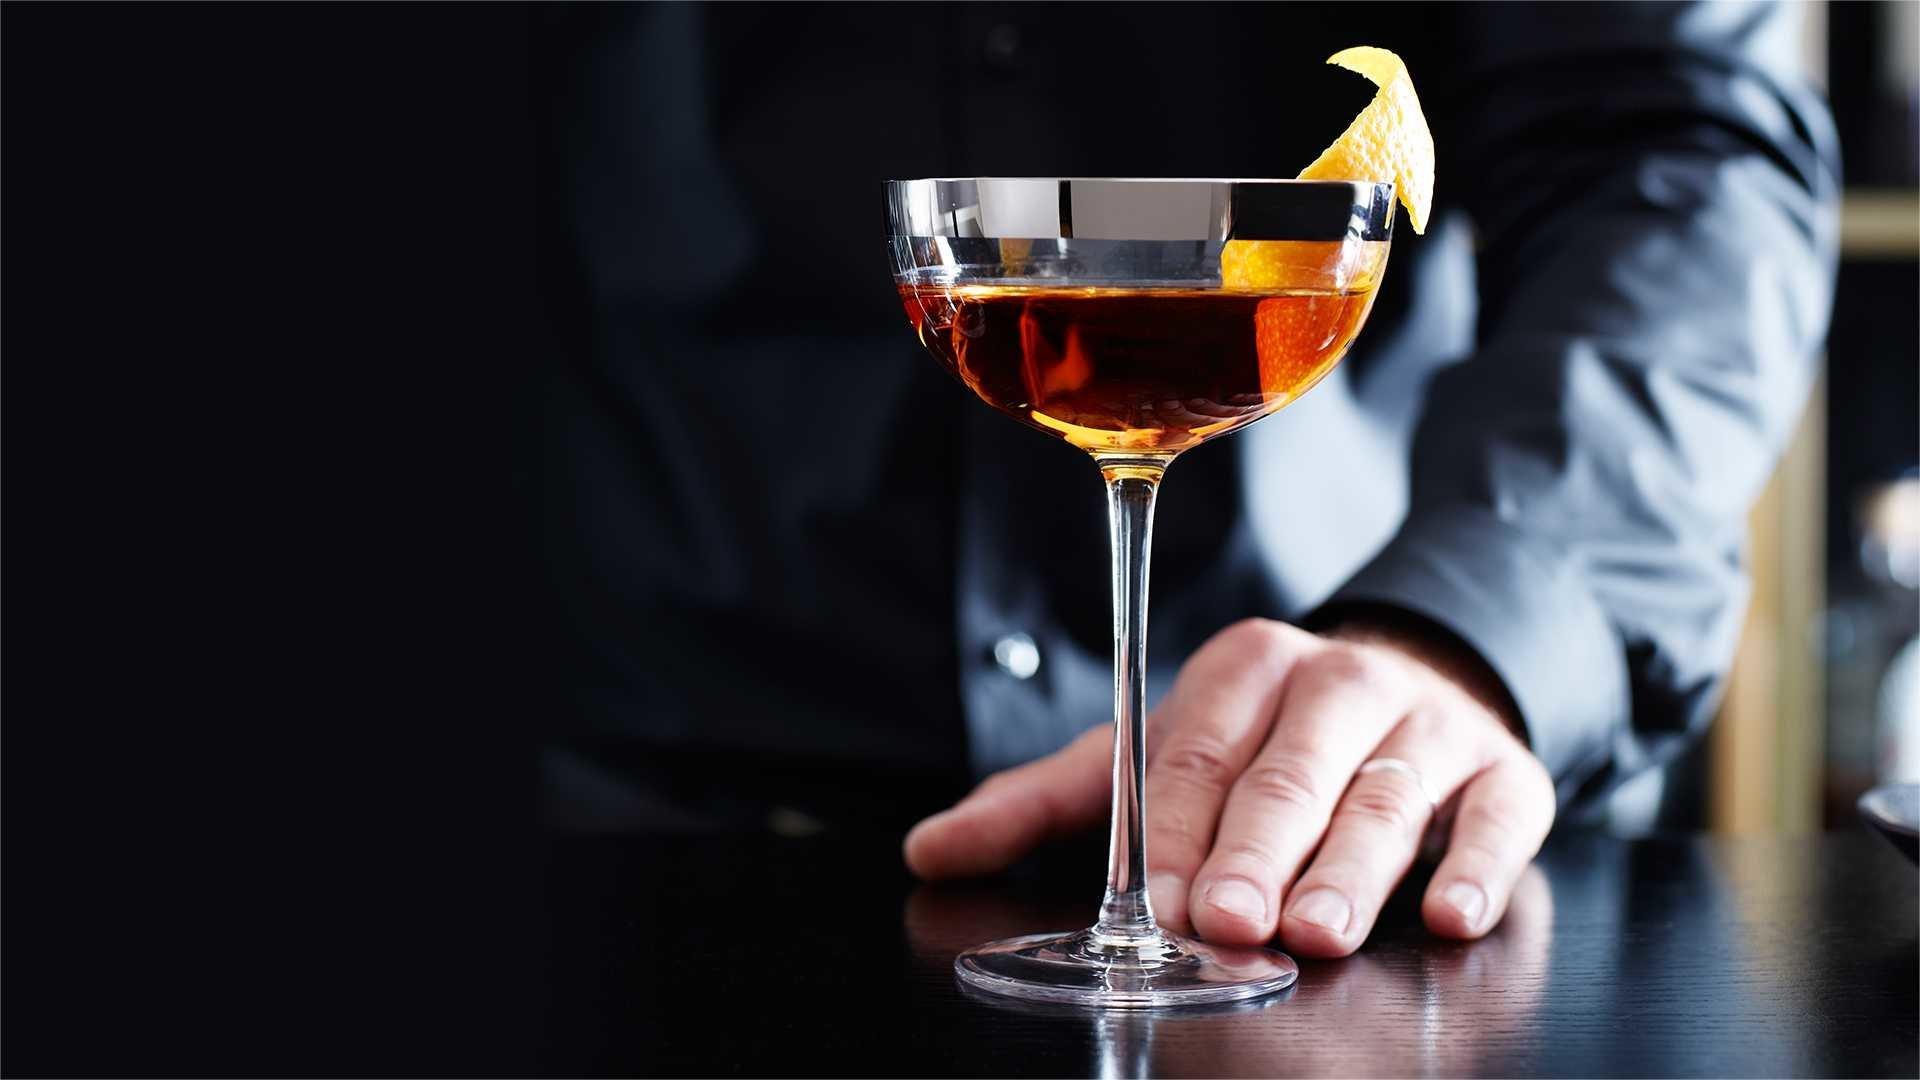 dHP_Cocktail1_160913_SC16.jpg